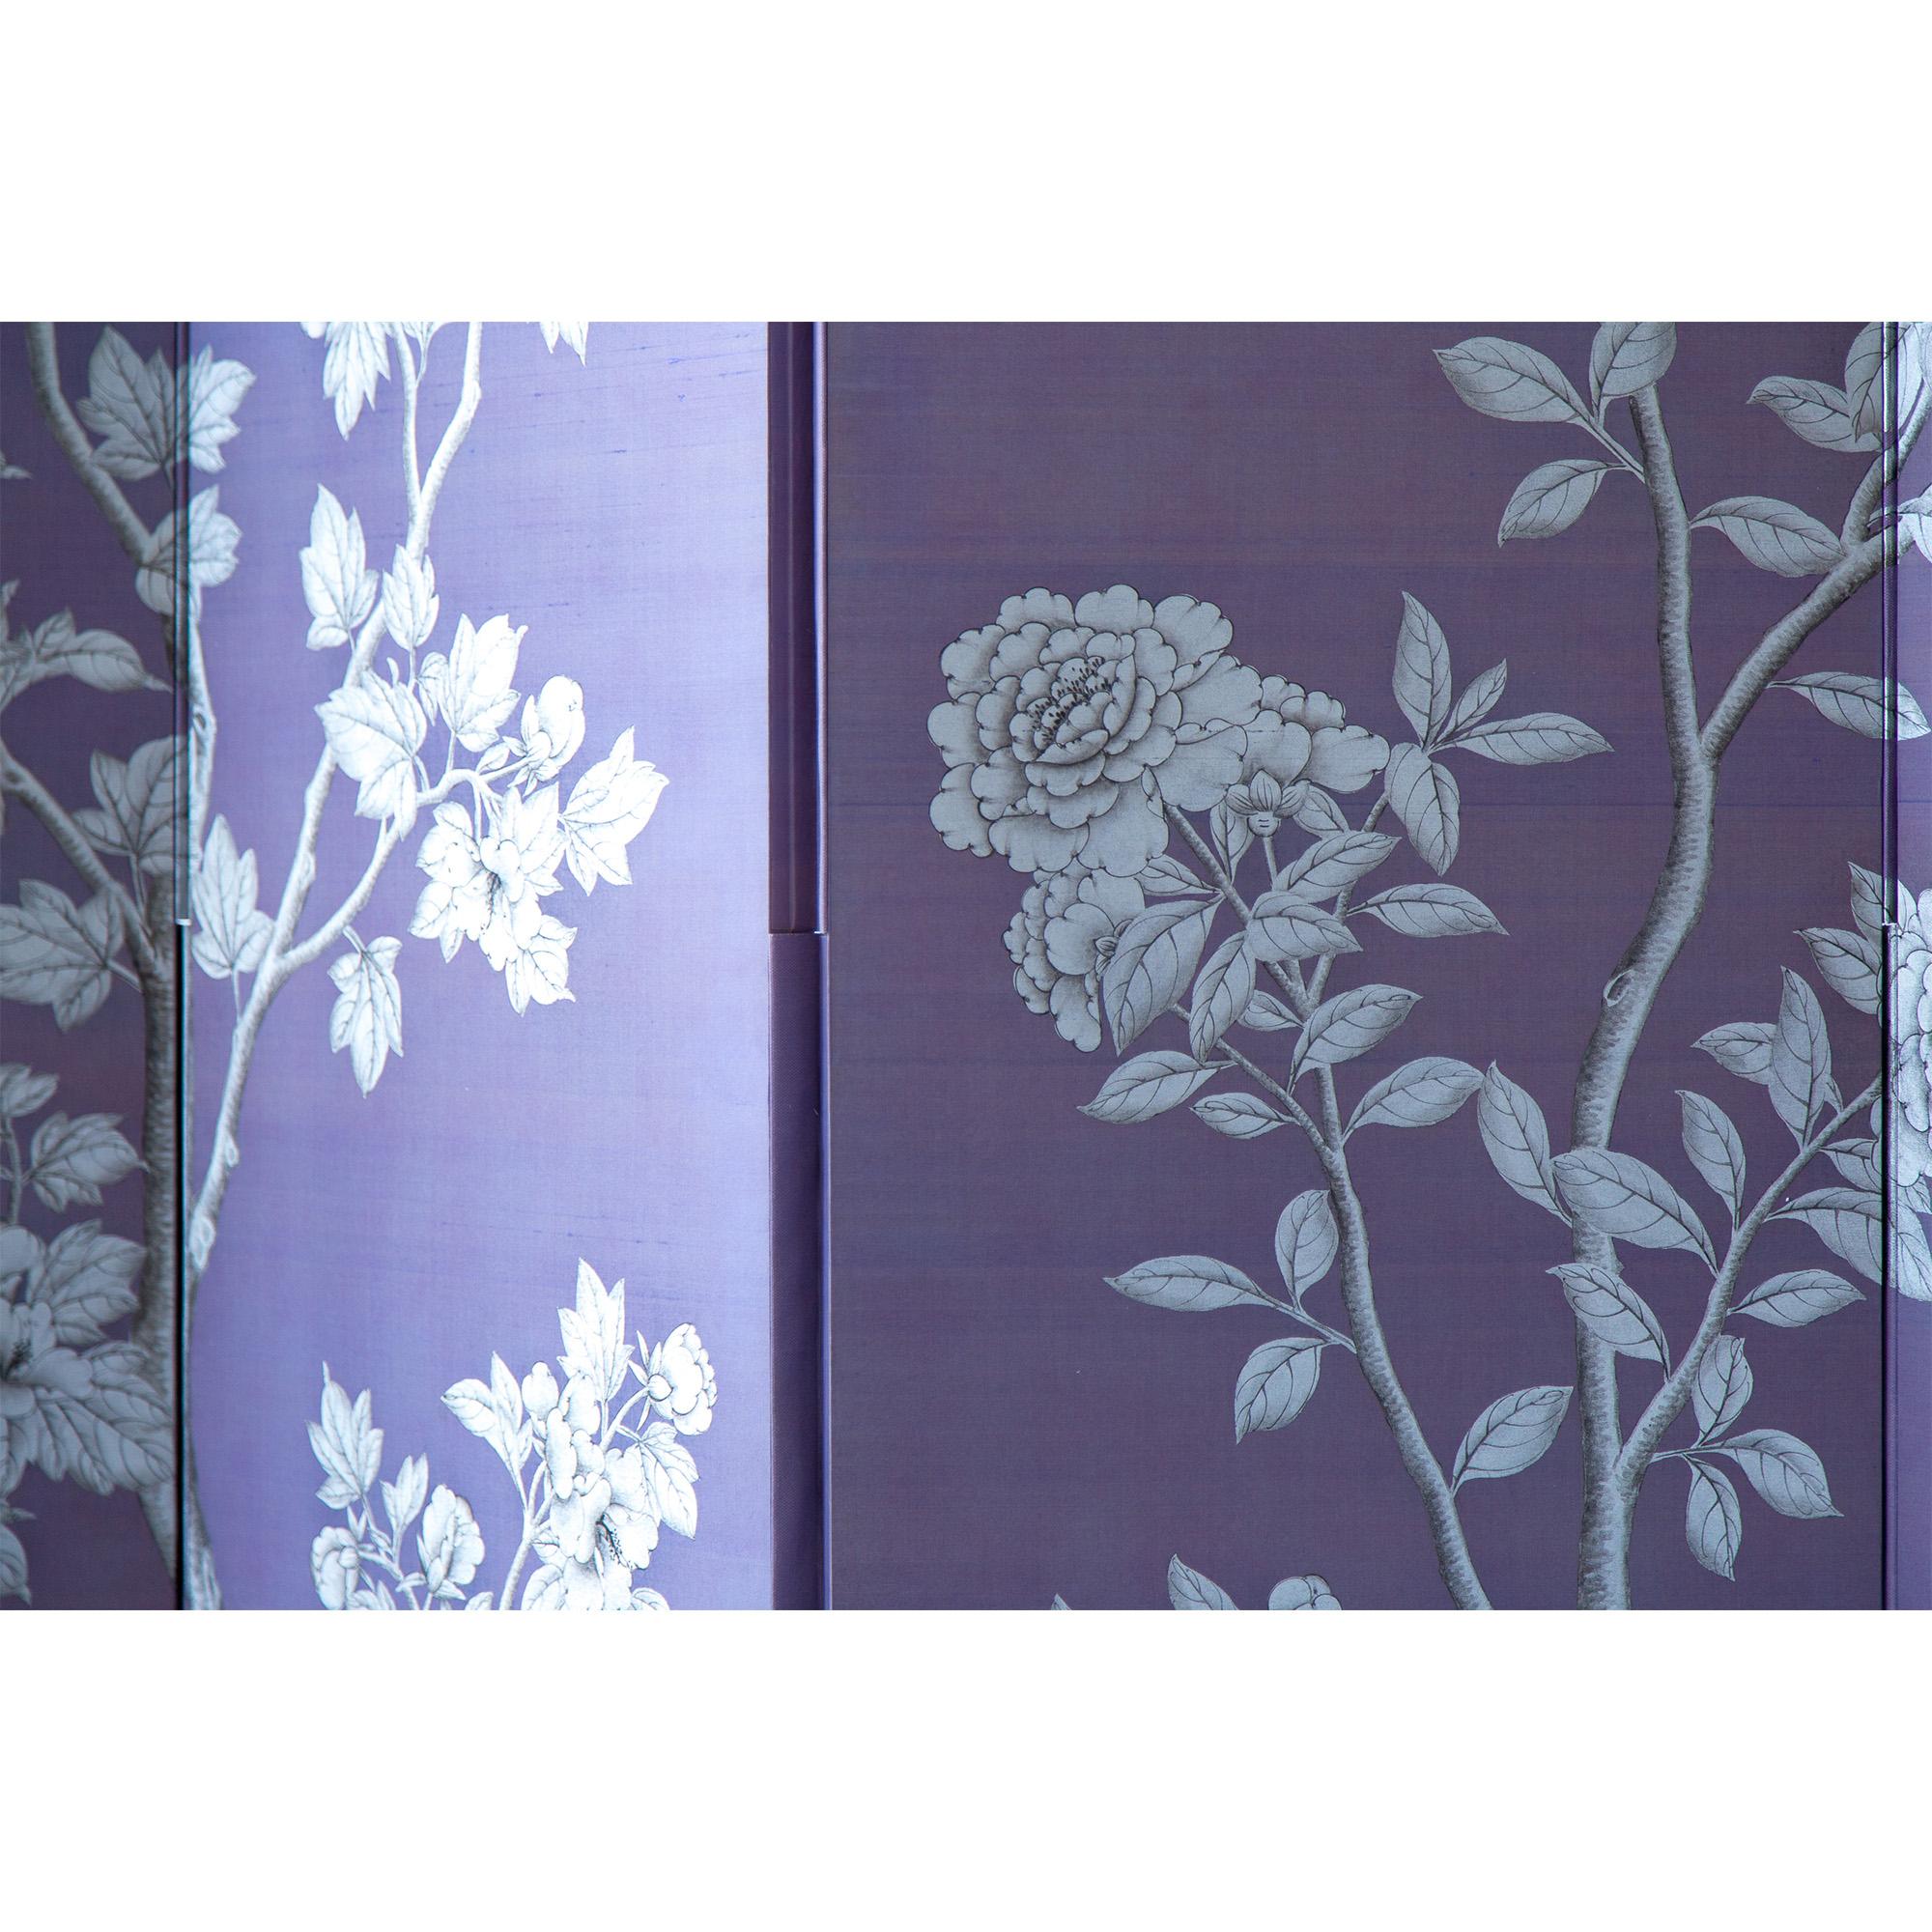 Furniture Images_Master 2_0005s_0002_IMG_4683.jpg